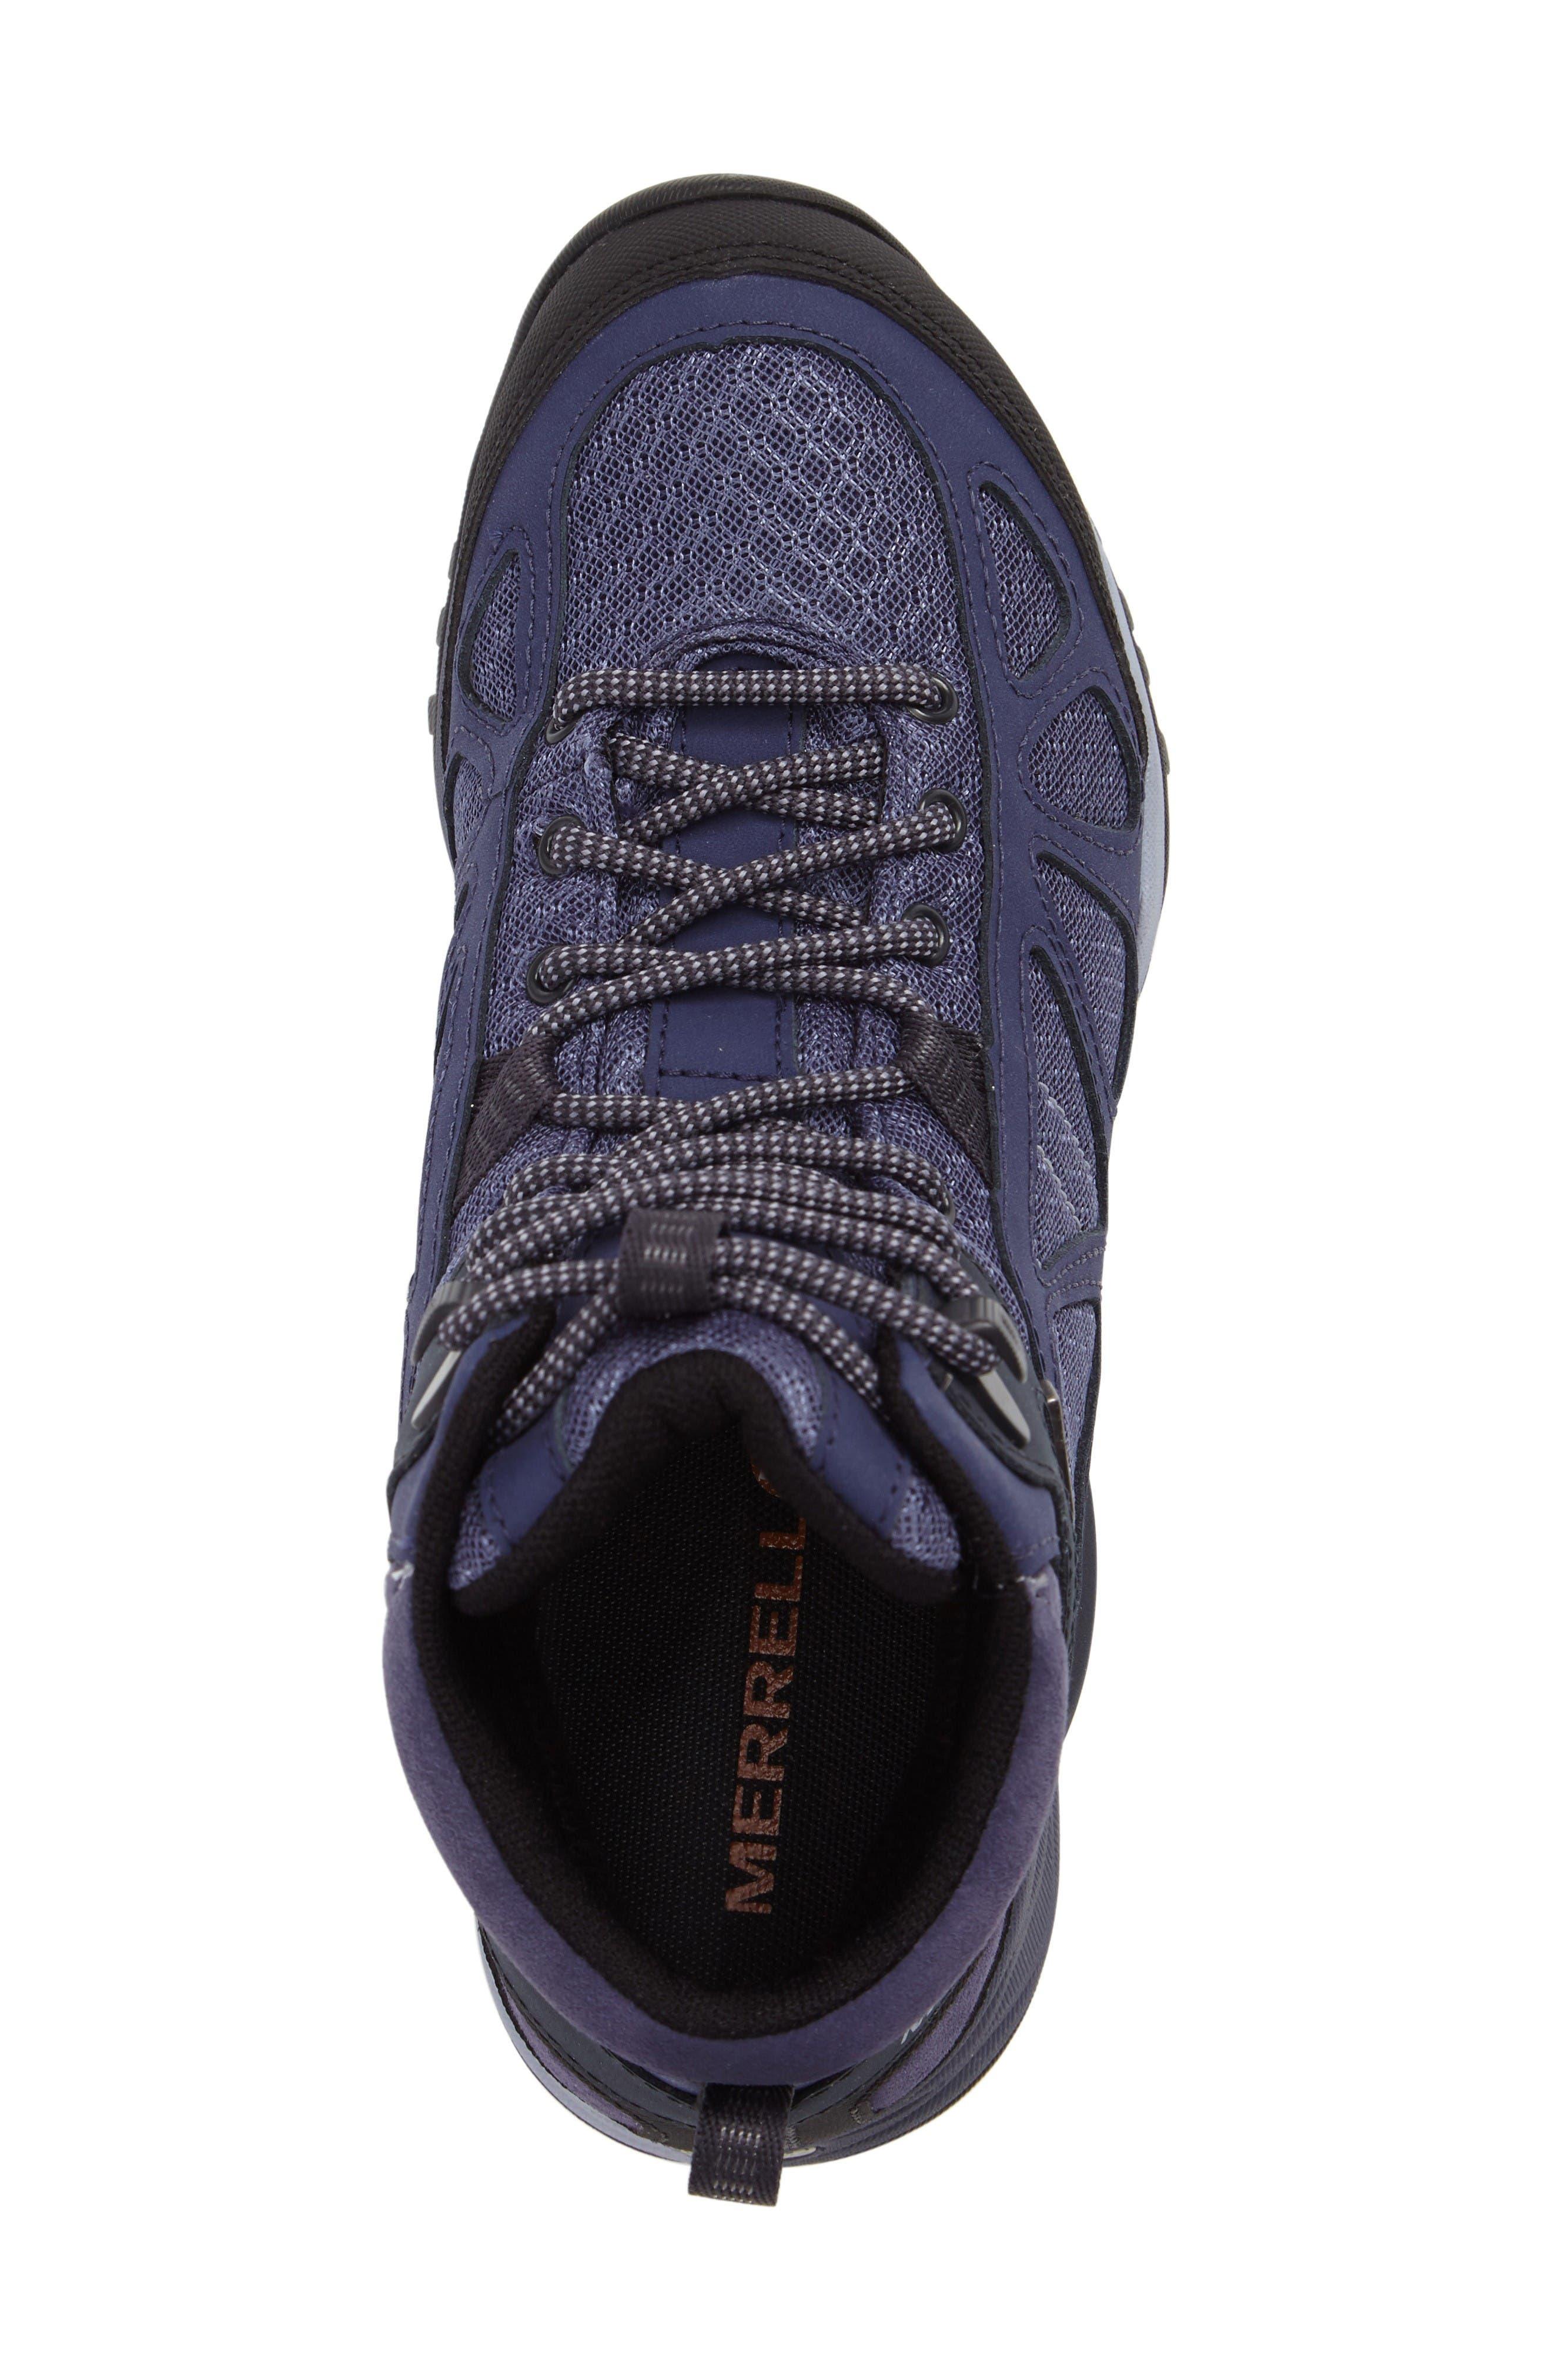 Siren Sport Q2 Waterproof Mid Top Sneaker,                             Alternate thumbnail 5, color,                             Crown Blue Nubuck Leather